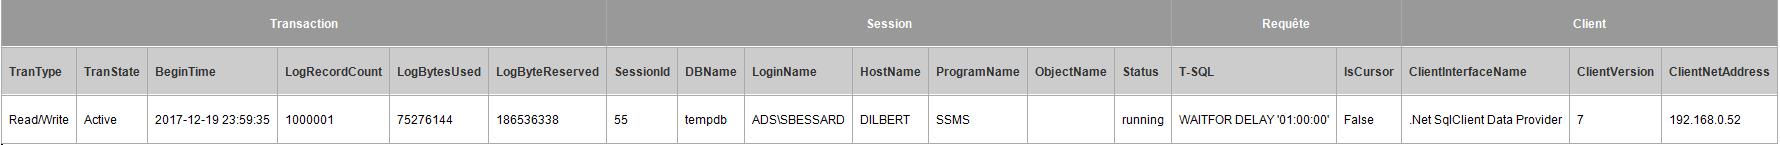 Expert SQL Server - Erreur : Transaction log for database 'xxx' is full due to 'ACTIVE_TRANSACTION' - SQL Server  - open_tran_mail